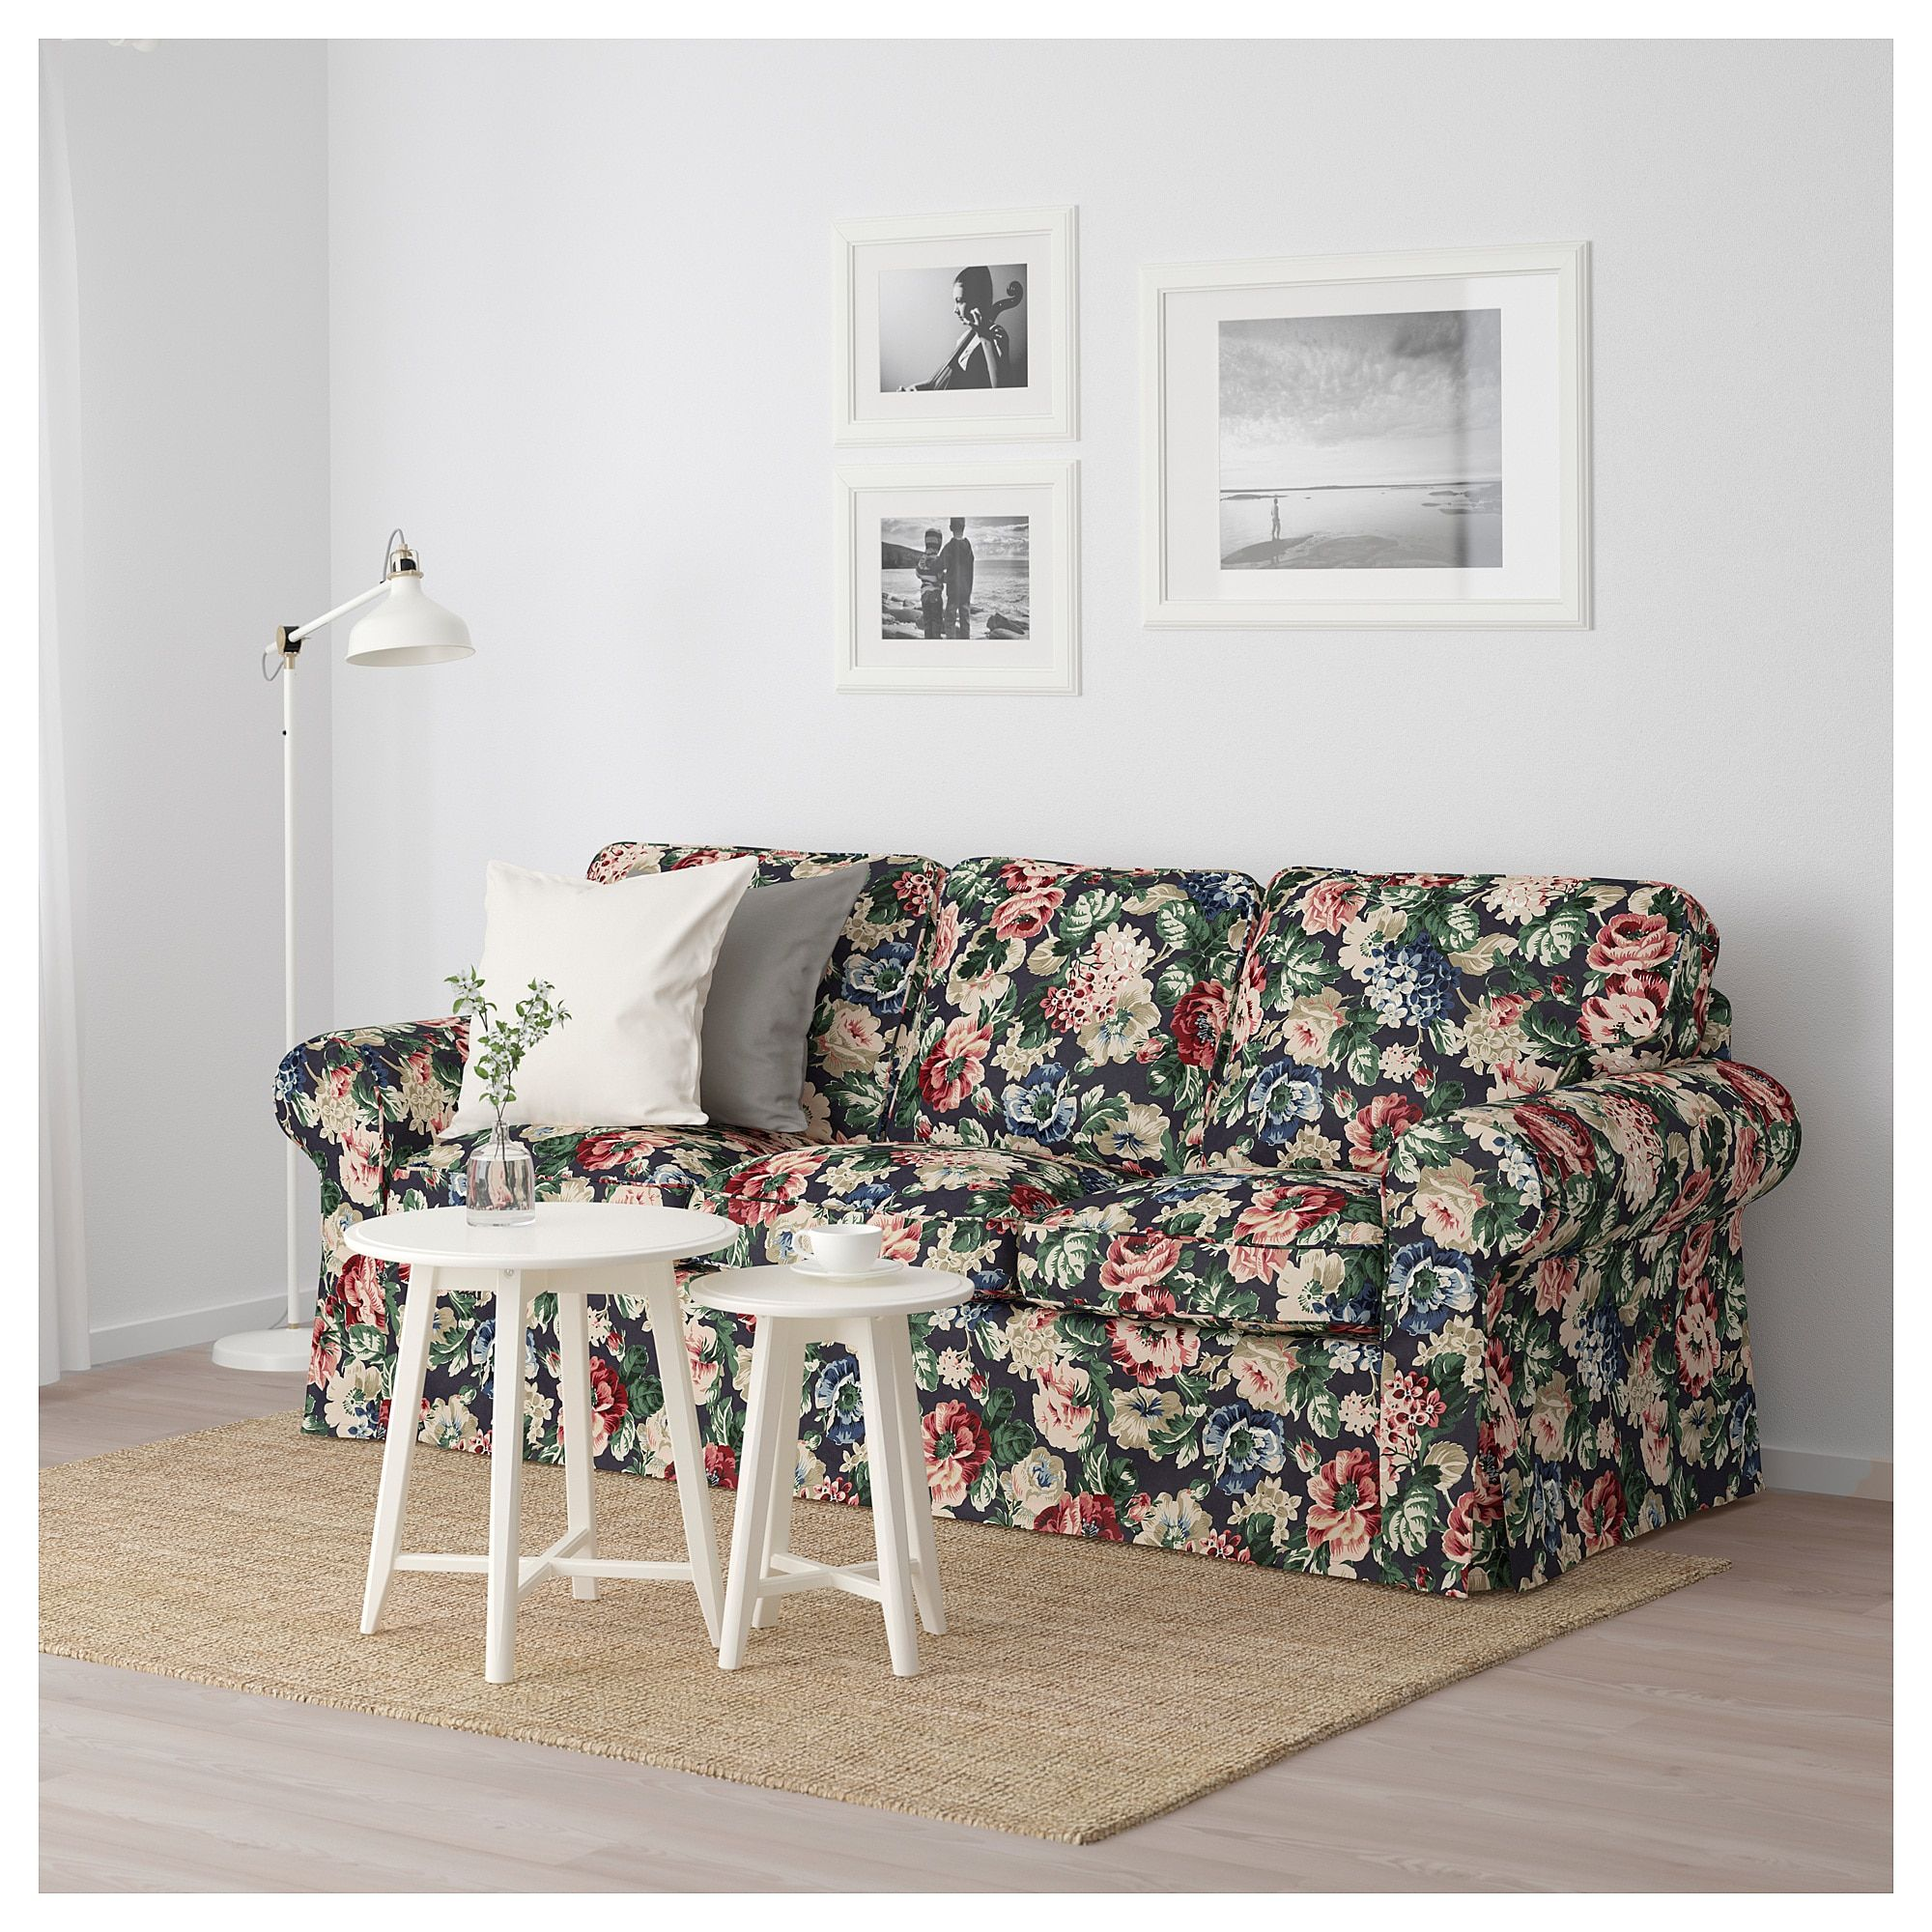 Excellent Ikea Ektorp Sofa Lingbo Multicolor In 2019 Living Room Squirreltailoven Fun Painted Chair Ideas Images Squirreltailovenorg